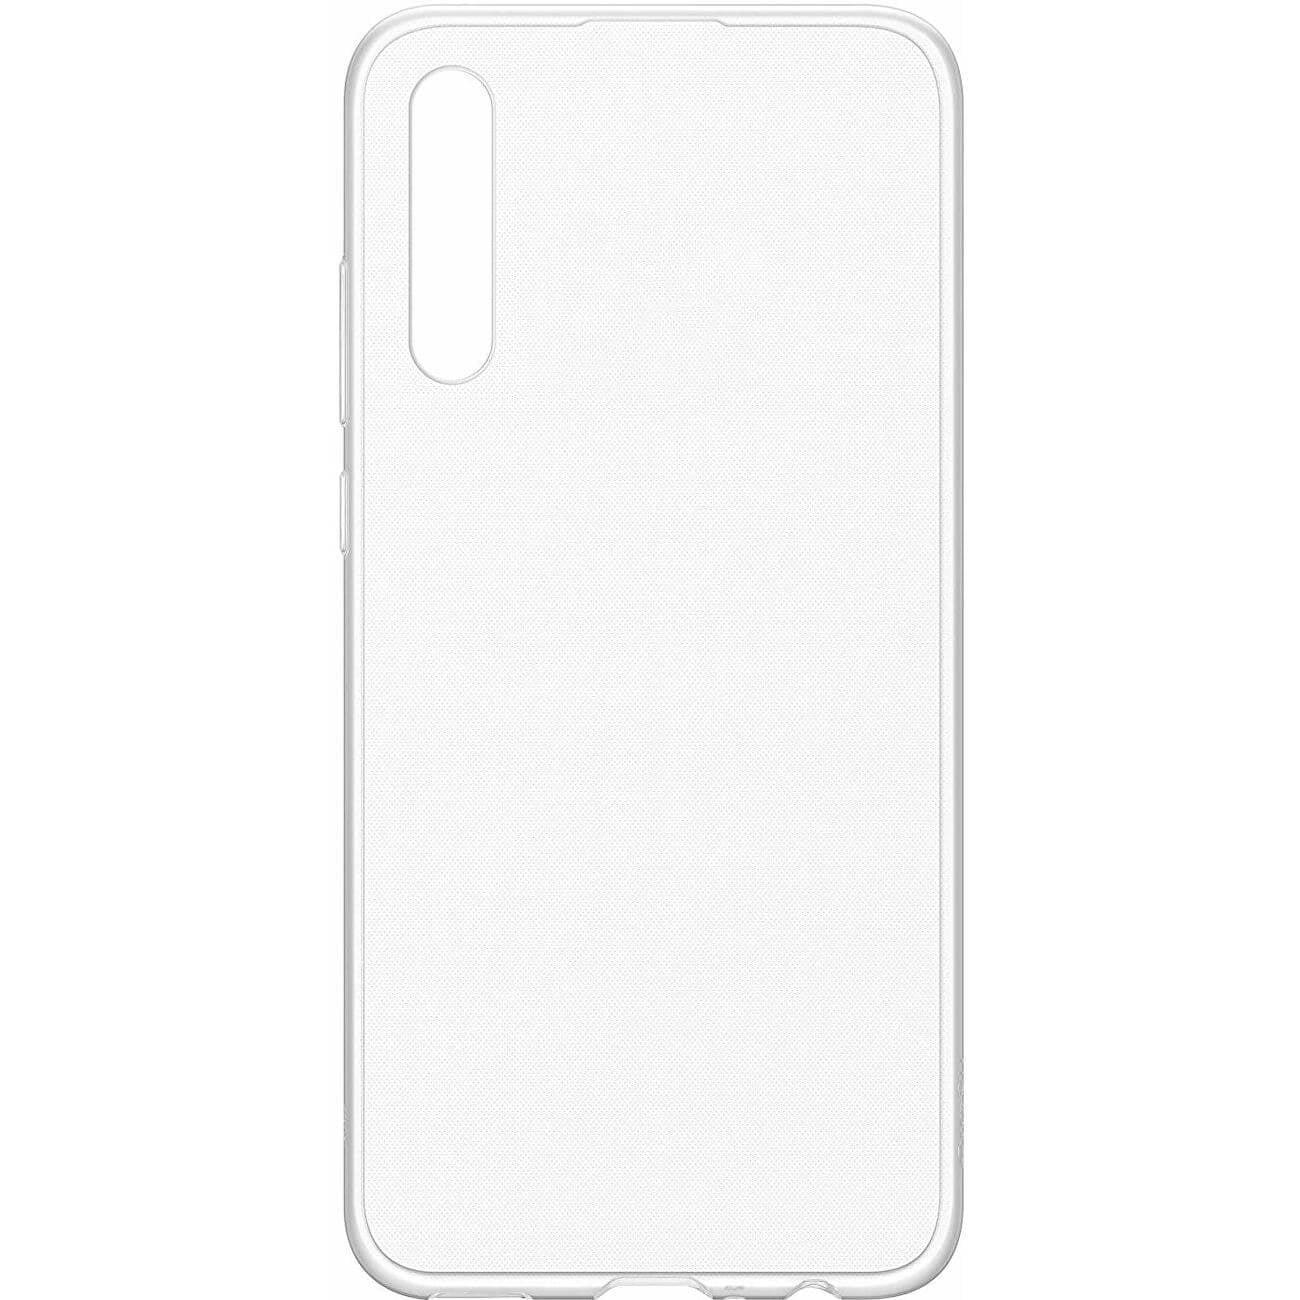 Husa silicon pentru Huawei P30, Clear Case, Transparent